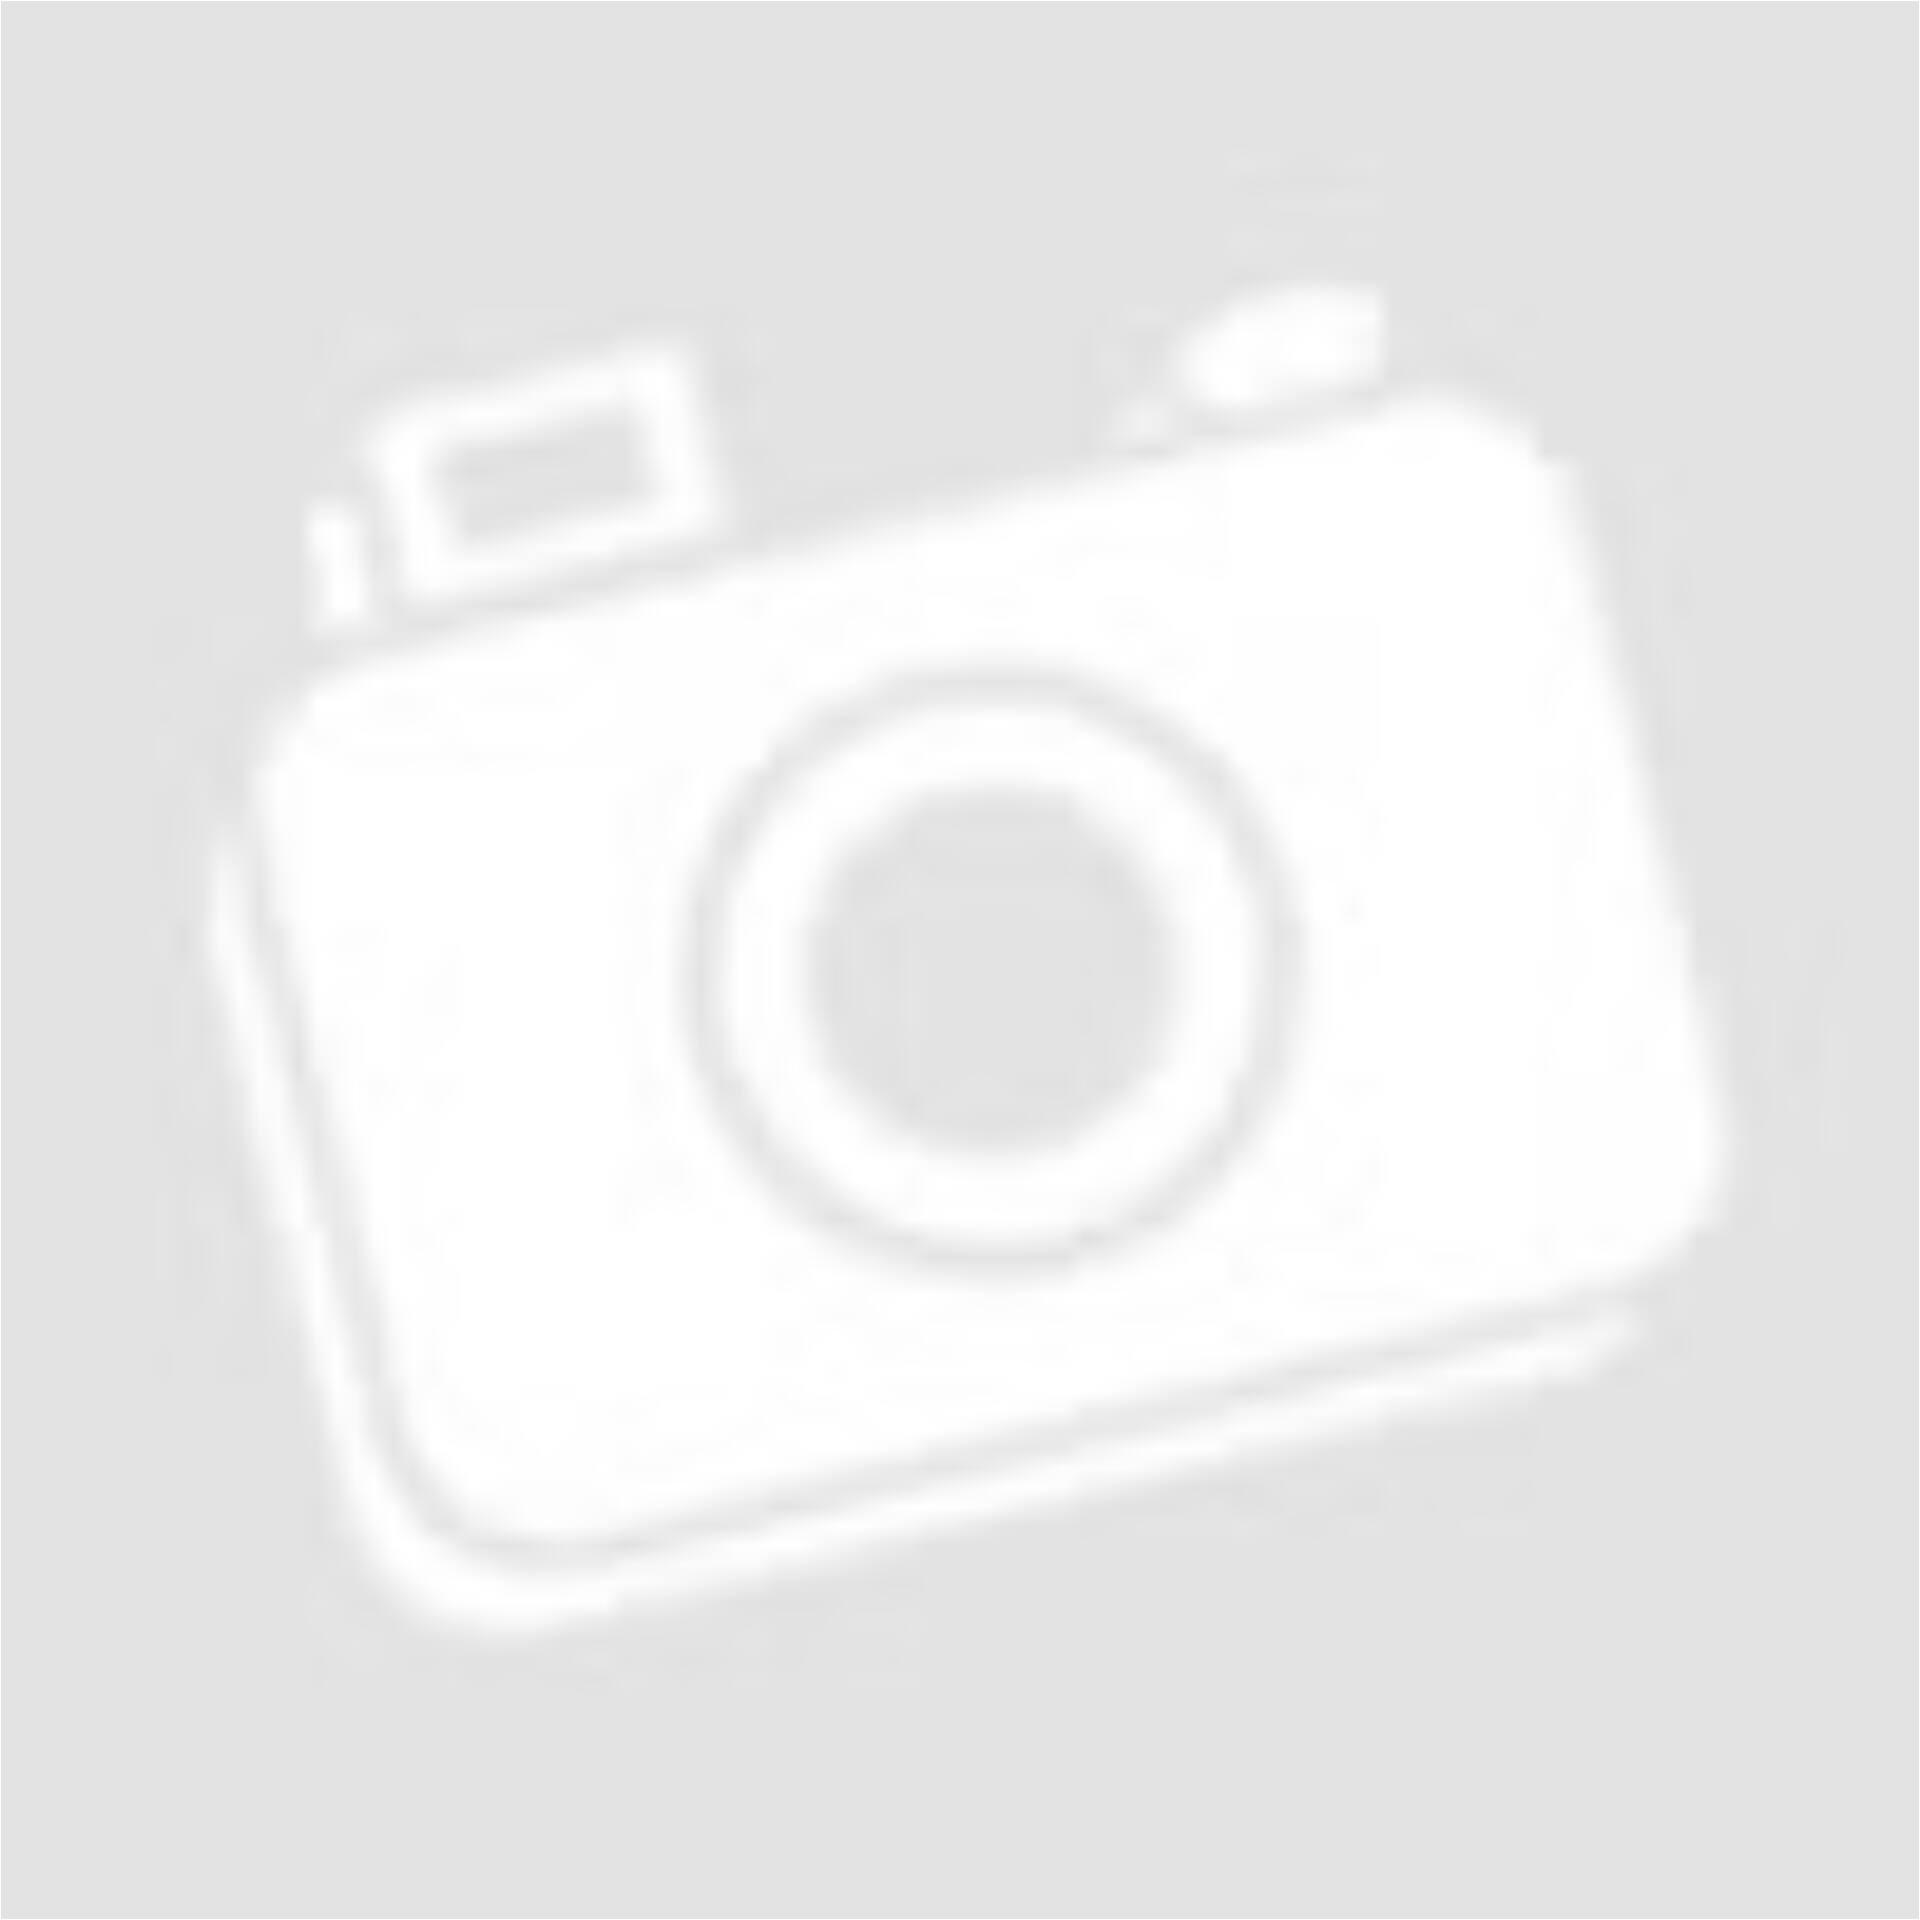 eece9c588b FB SISTER fekete-piros kockás ing (Méret: M) - Női póló, trikó, topp ...